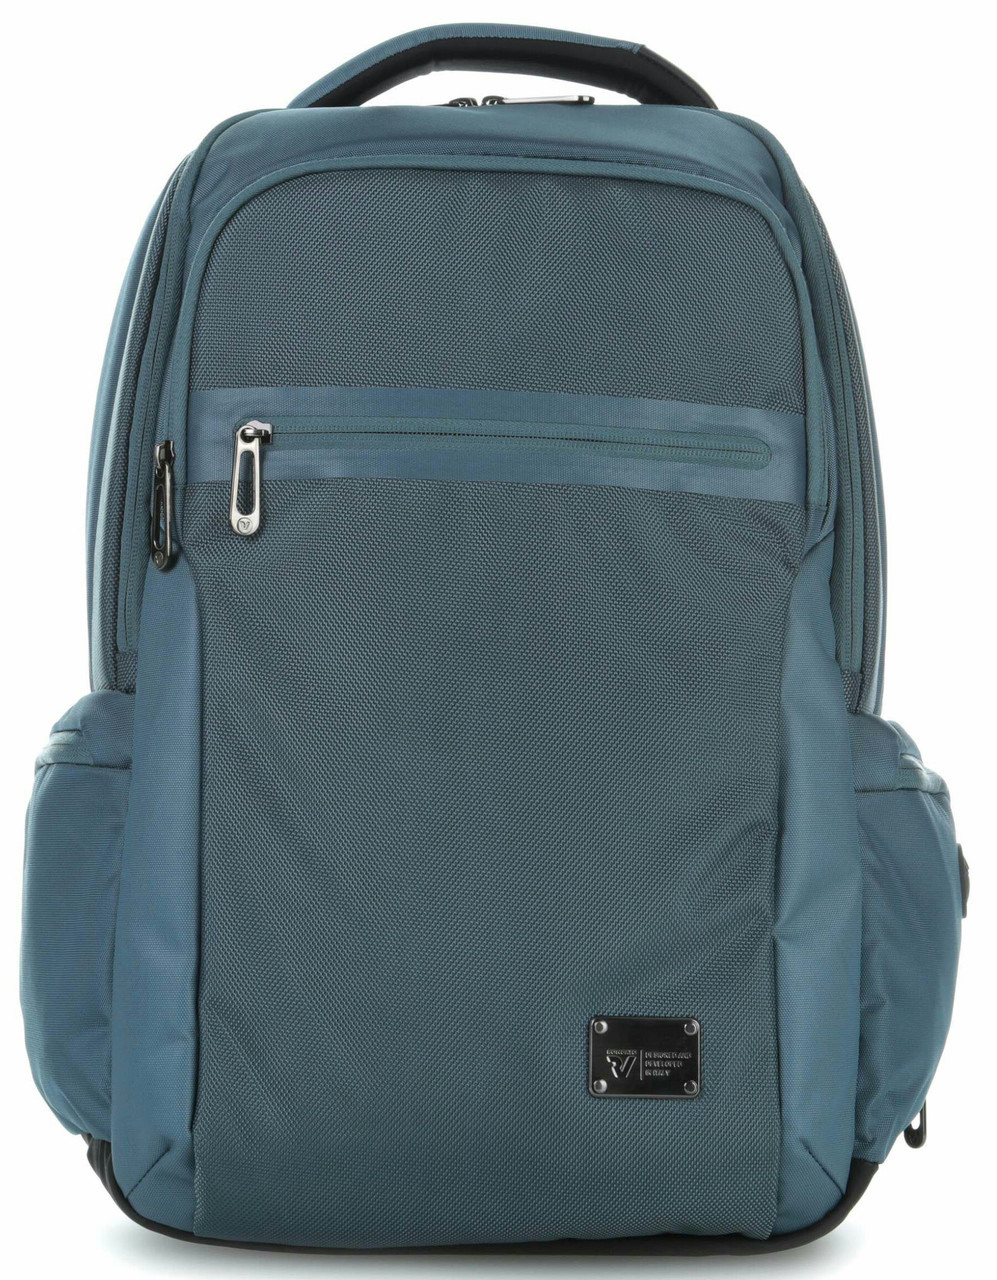 Спортивный рюкзак Roncato 417181 62, синий, 25л